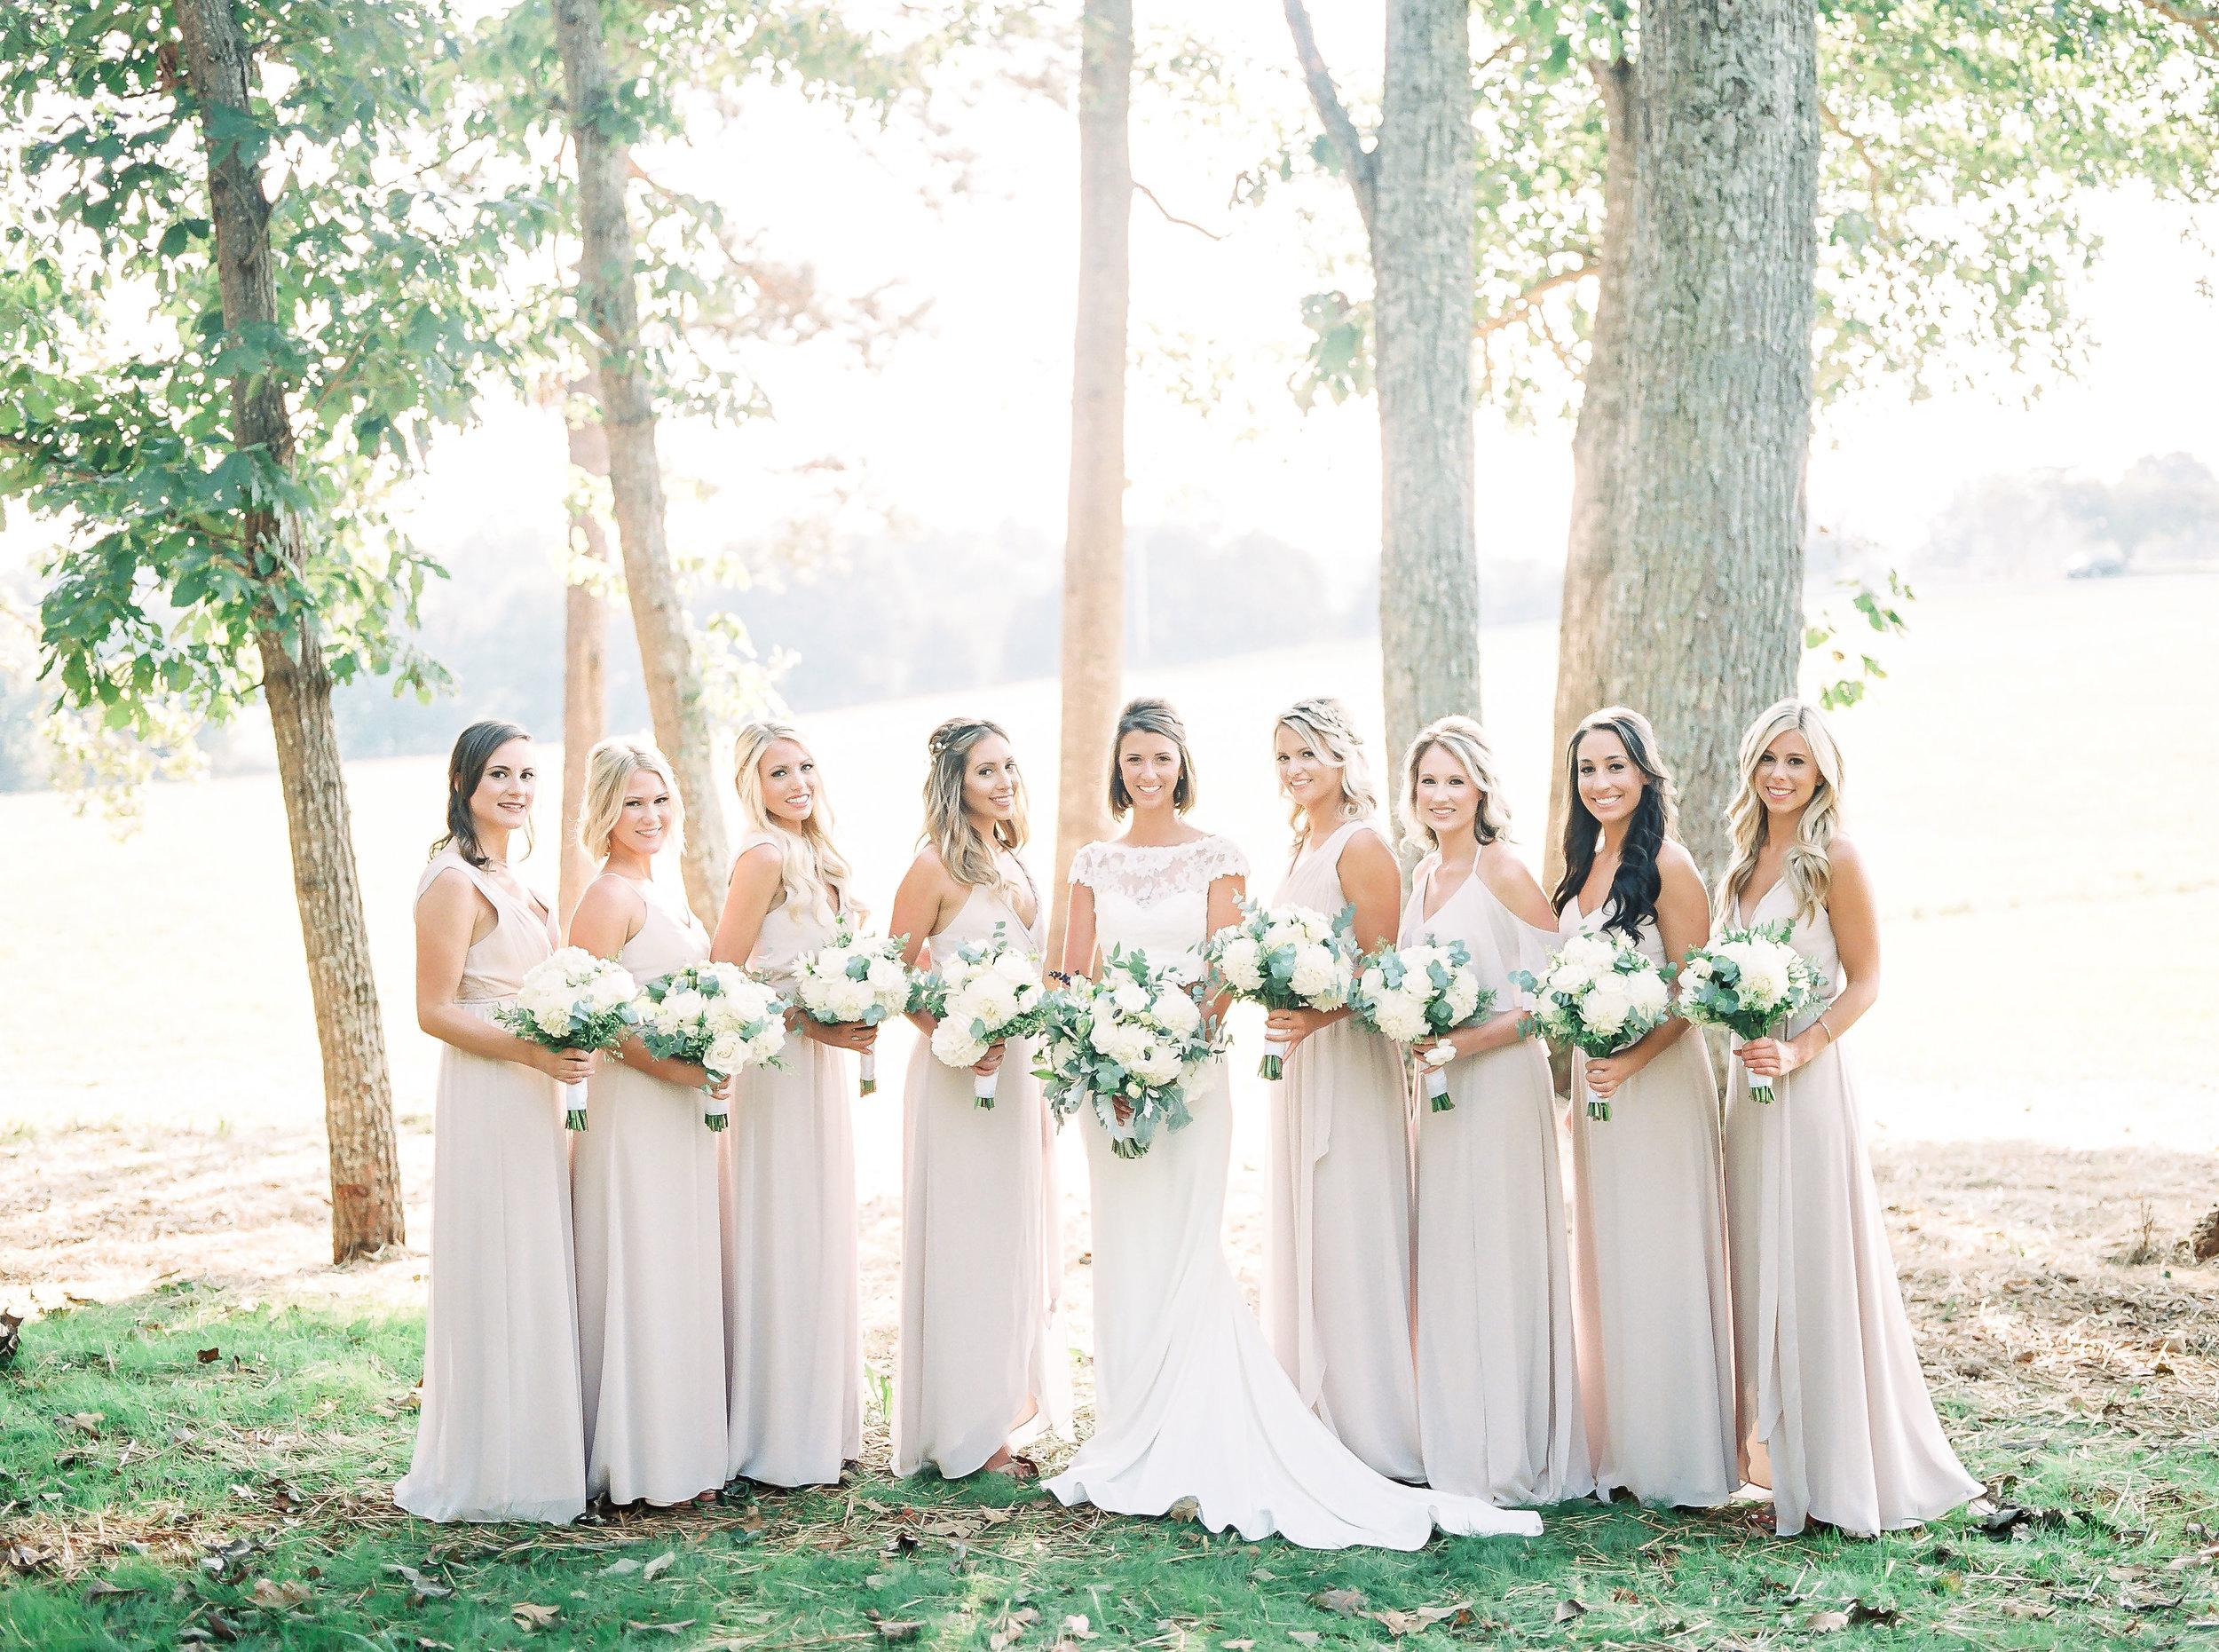 Bridesmaids_20.jpg